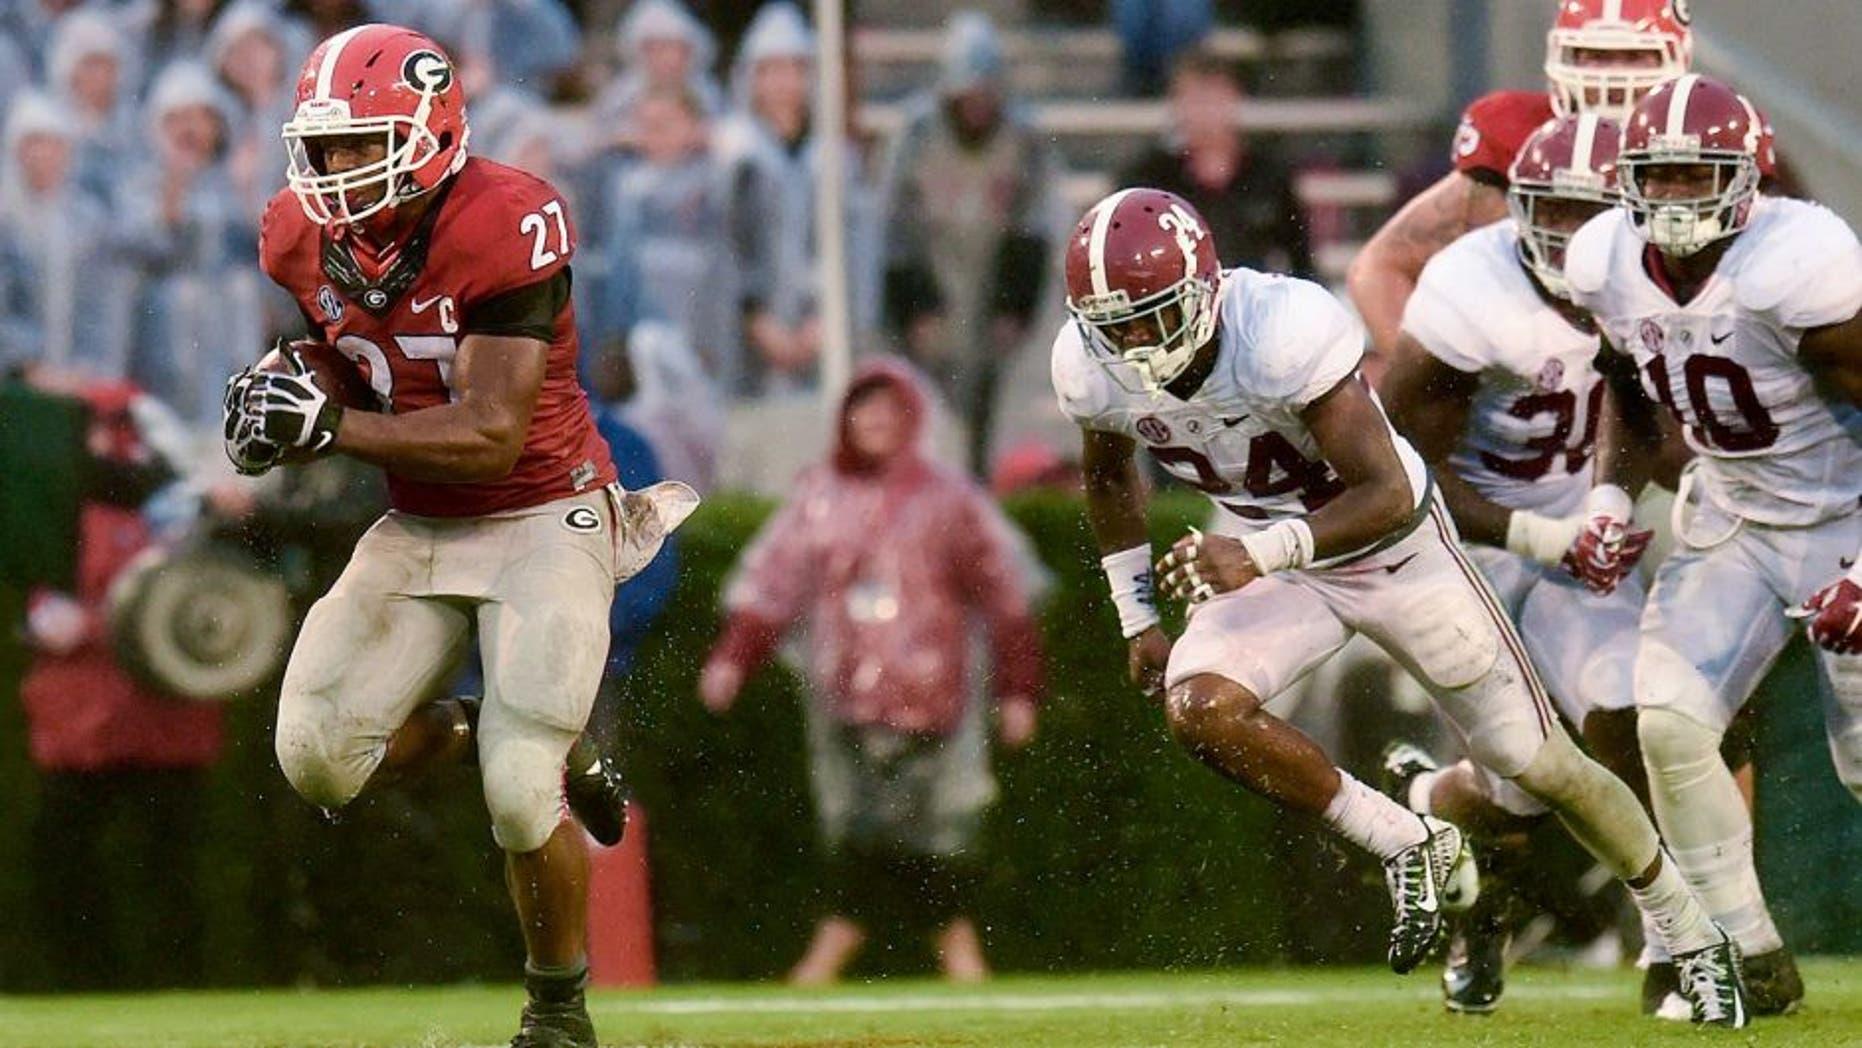 Oct 3, 2015; Athens, GA, USA; Georgia Bulldogs running back Nick Chubb (27) runs the ball past Alabama Crimson Tide defensive back Geno Matias-Smith (24) for a touchdown during the third quarter at Sanford Stadium. Mandatory Credit: Dale Zanine-USA TODAY Sports